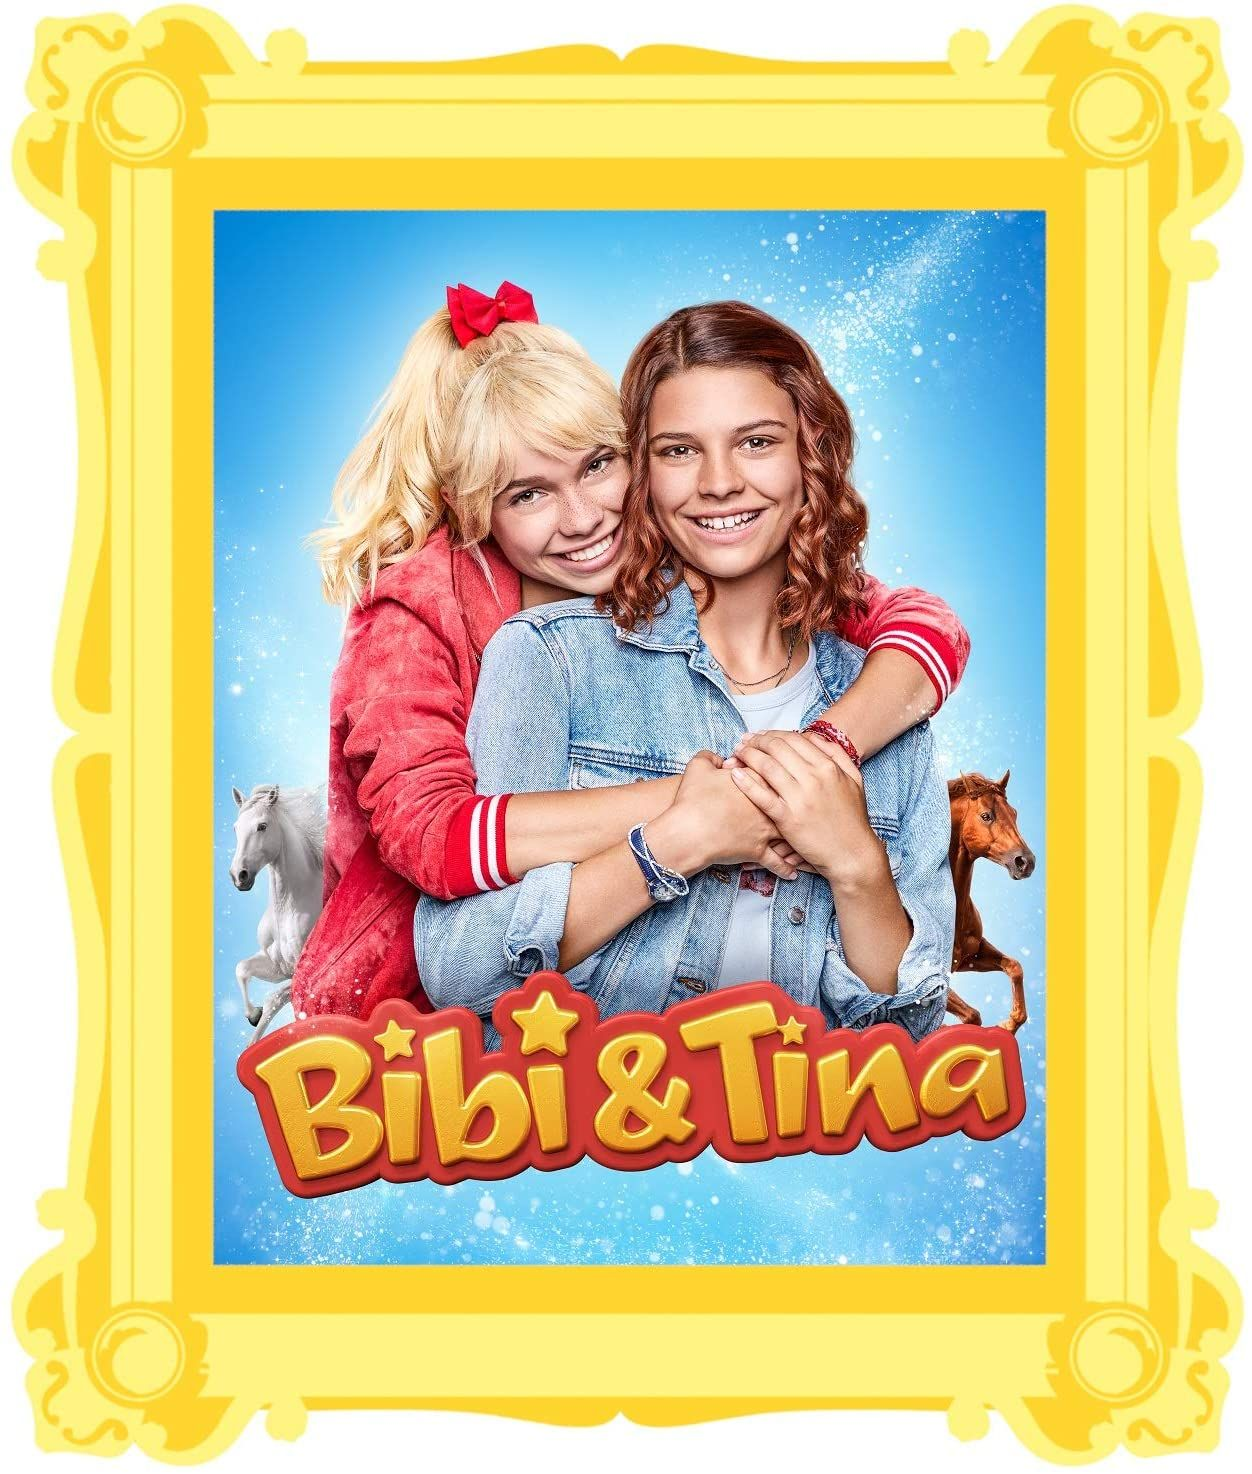 Bibi Tina Serie Wandtattoos Mit Bibi Tina Pferden Bibi Und Tina Wandtattoos Kinder Zimmer